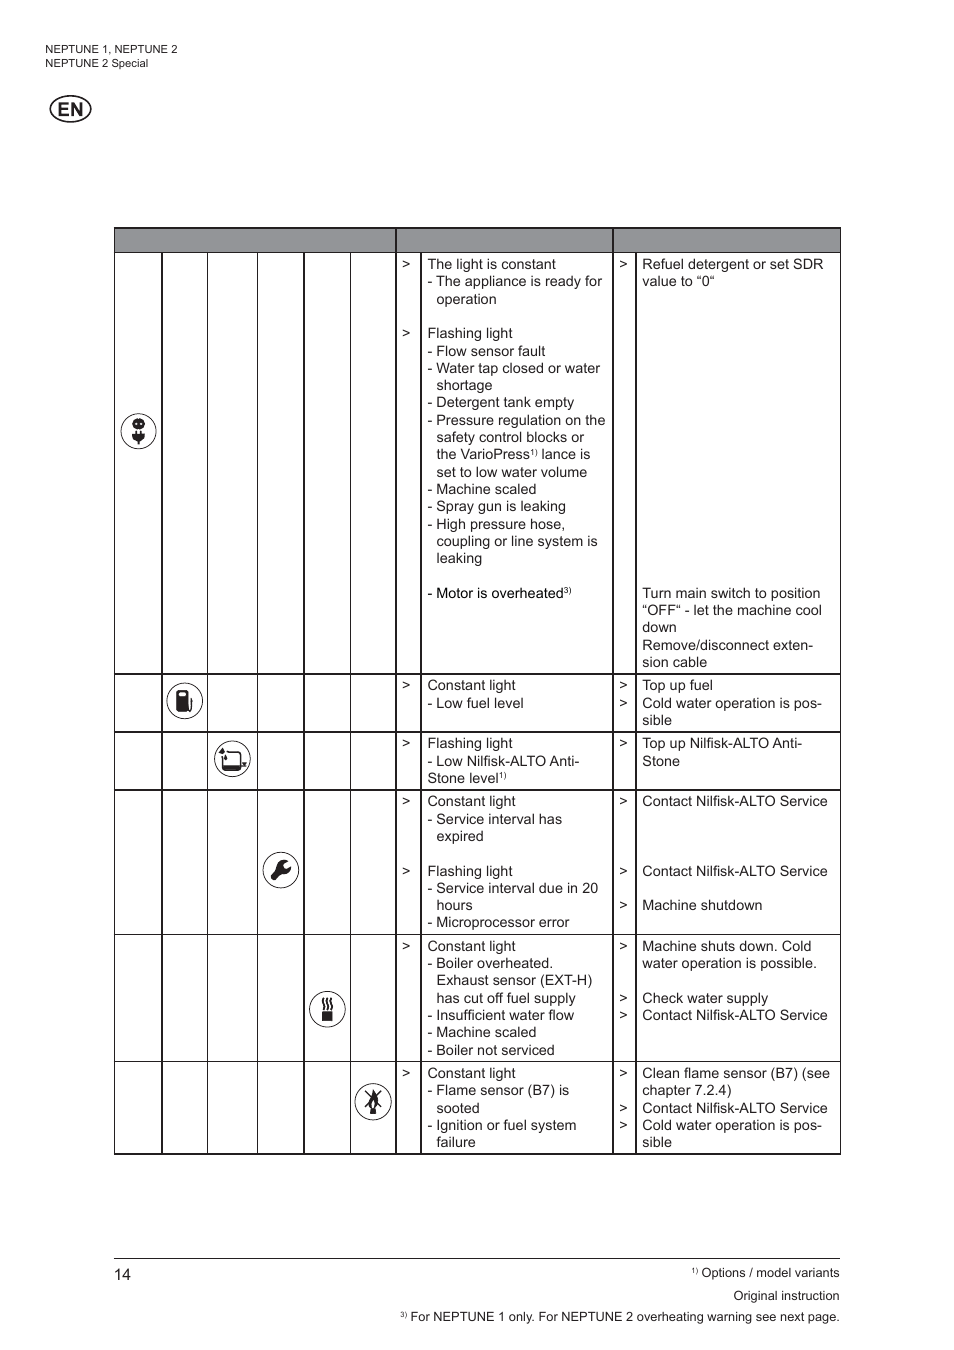 8 troubleshooting nilfisk alto neptune 1 user manual page 16 rh manualsdir com nilfisk alto neptune 4 user manual nilfisk vacuum cleaner user manual